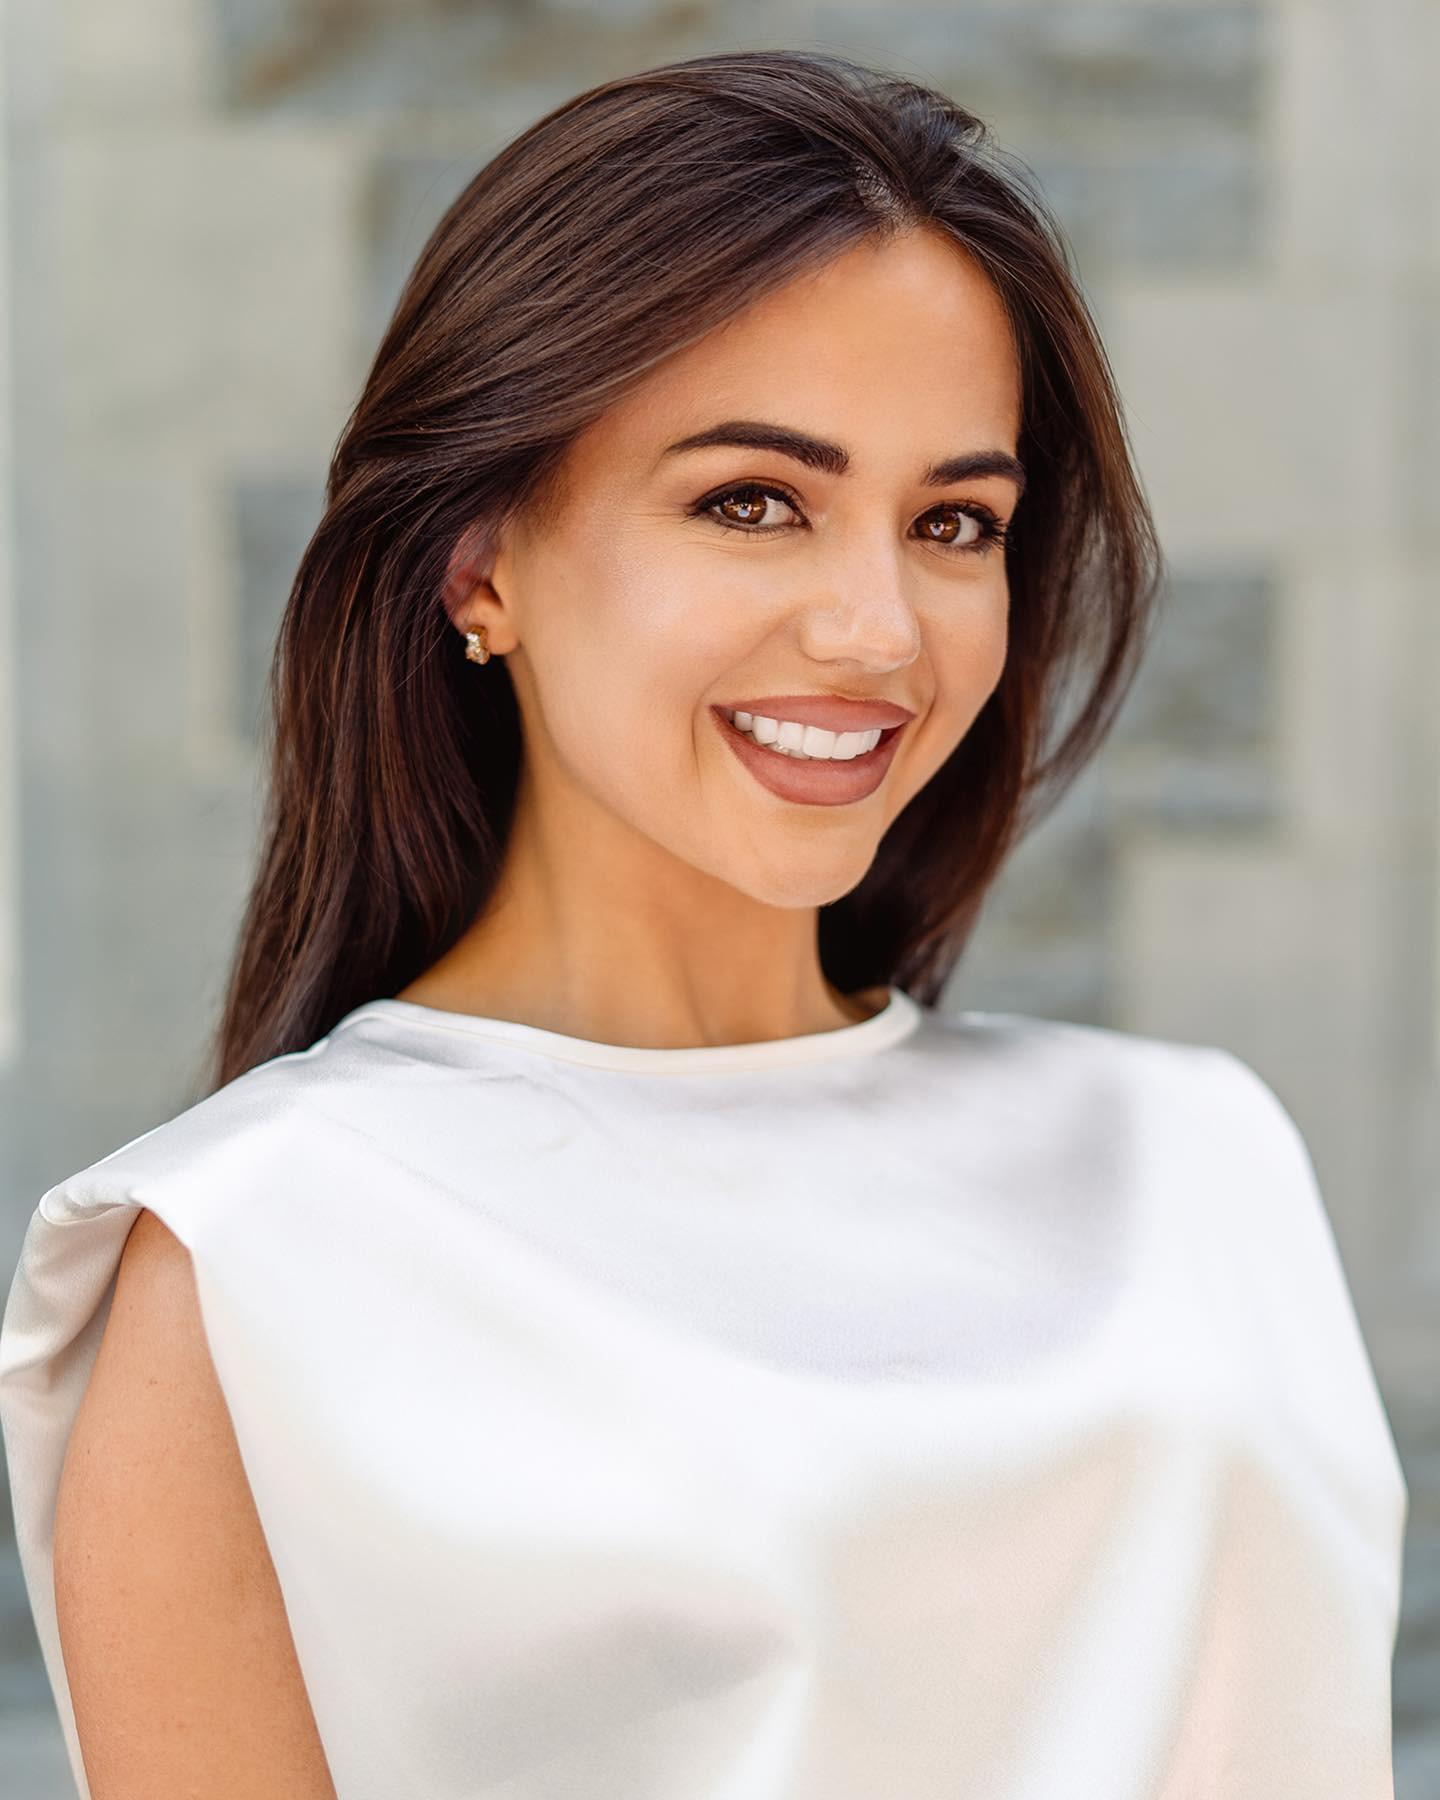 candidatas a miss earth ireland 2021. final: 27 de agosto. - Página 2 R0m30v